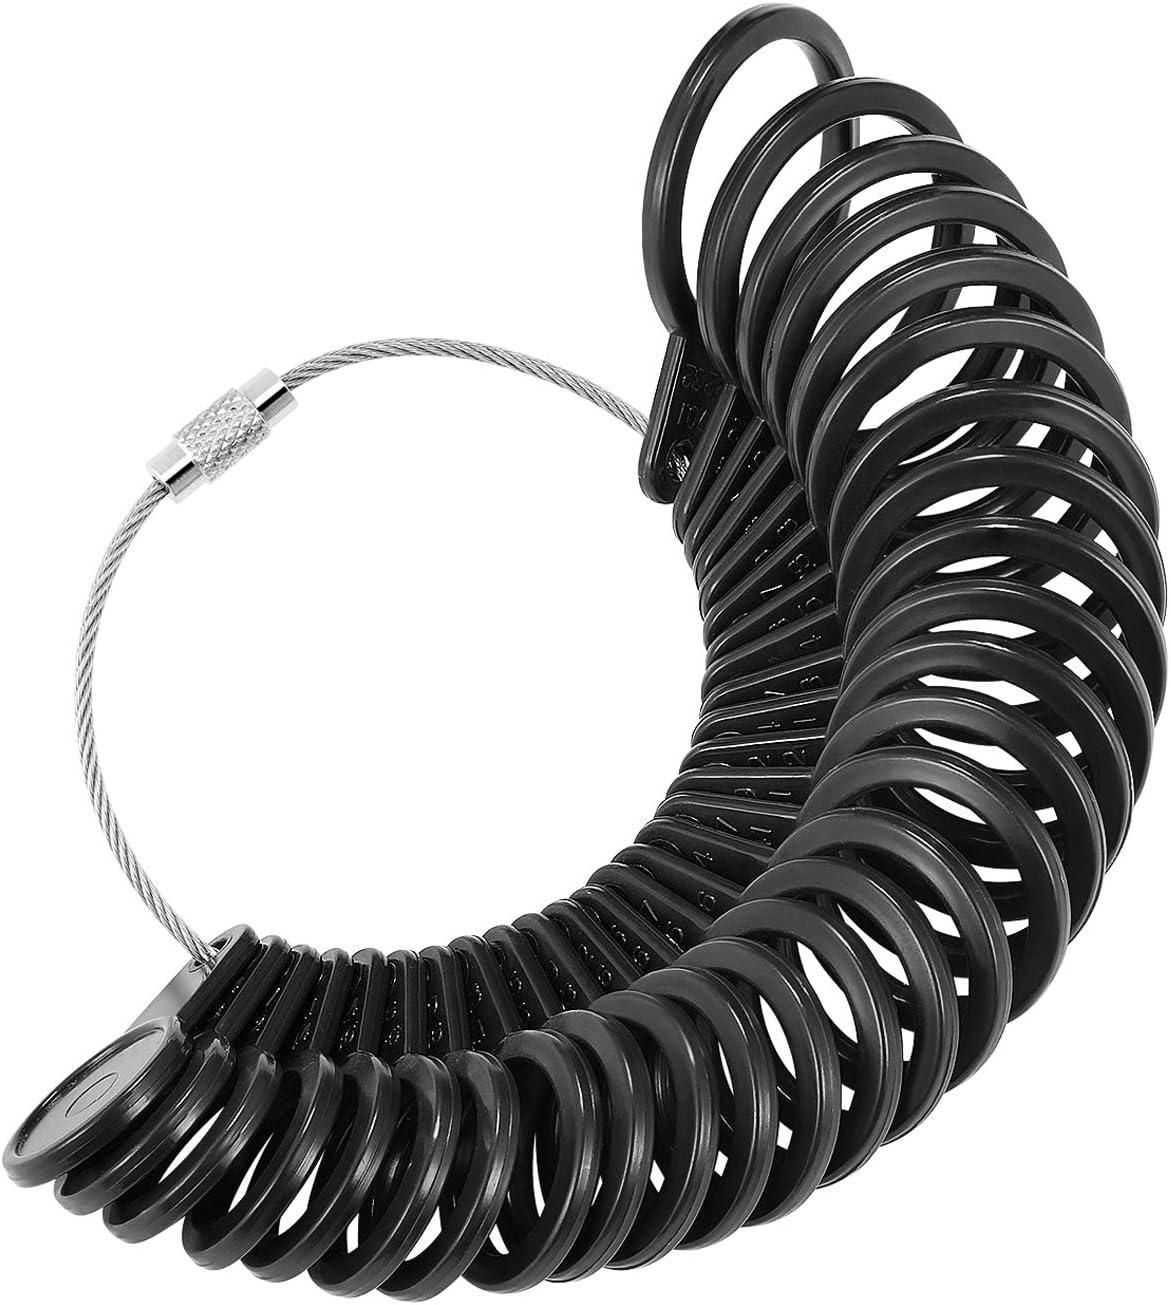 Flexzion Ring Sizer US UK free shipping Gauge Sizing Finger Measuring Set Memphis Mall Jew